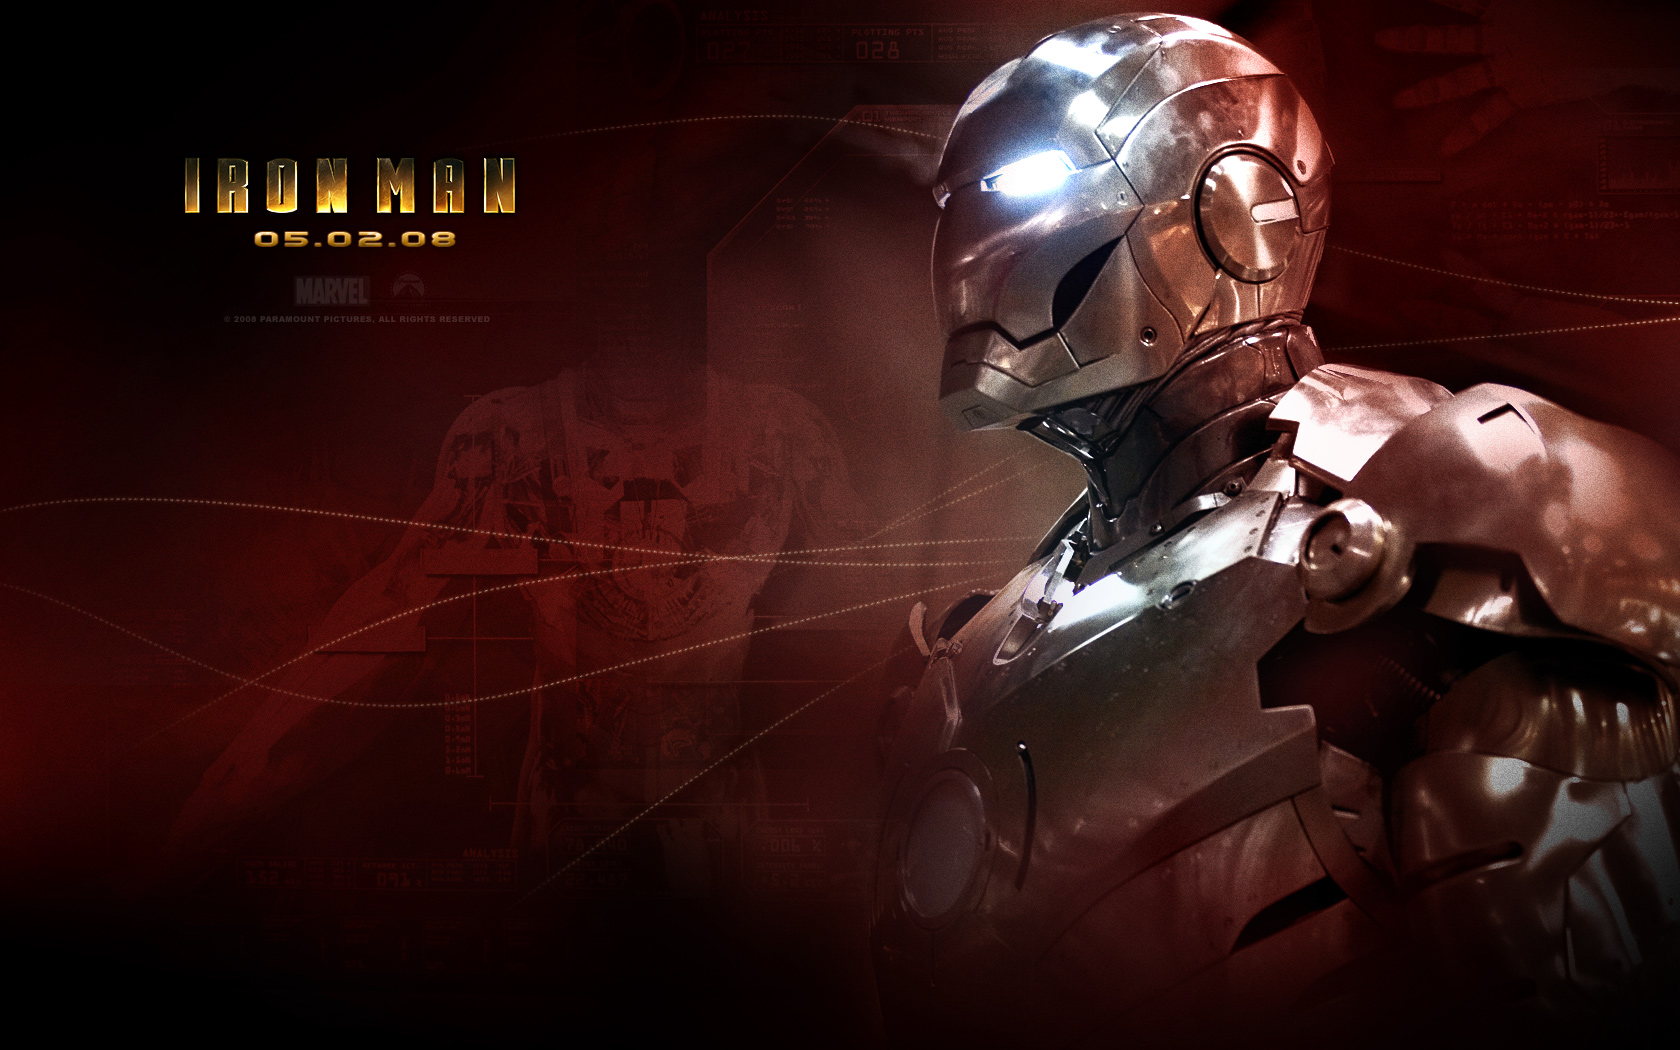 Iron Man wallpaper 7